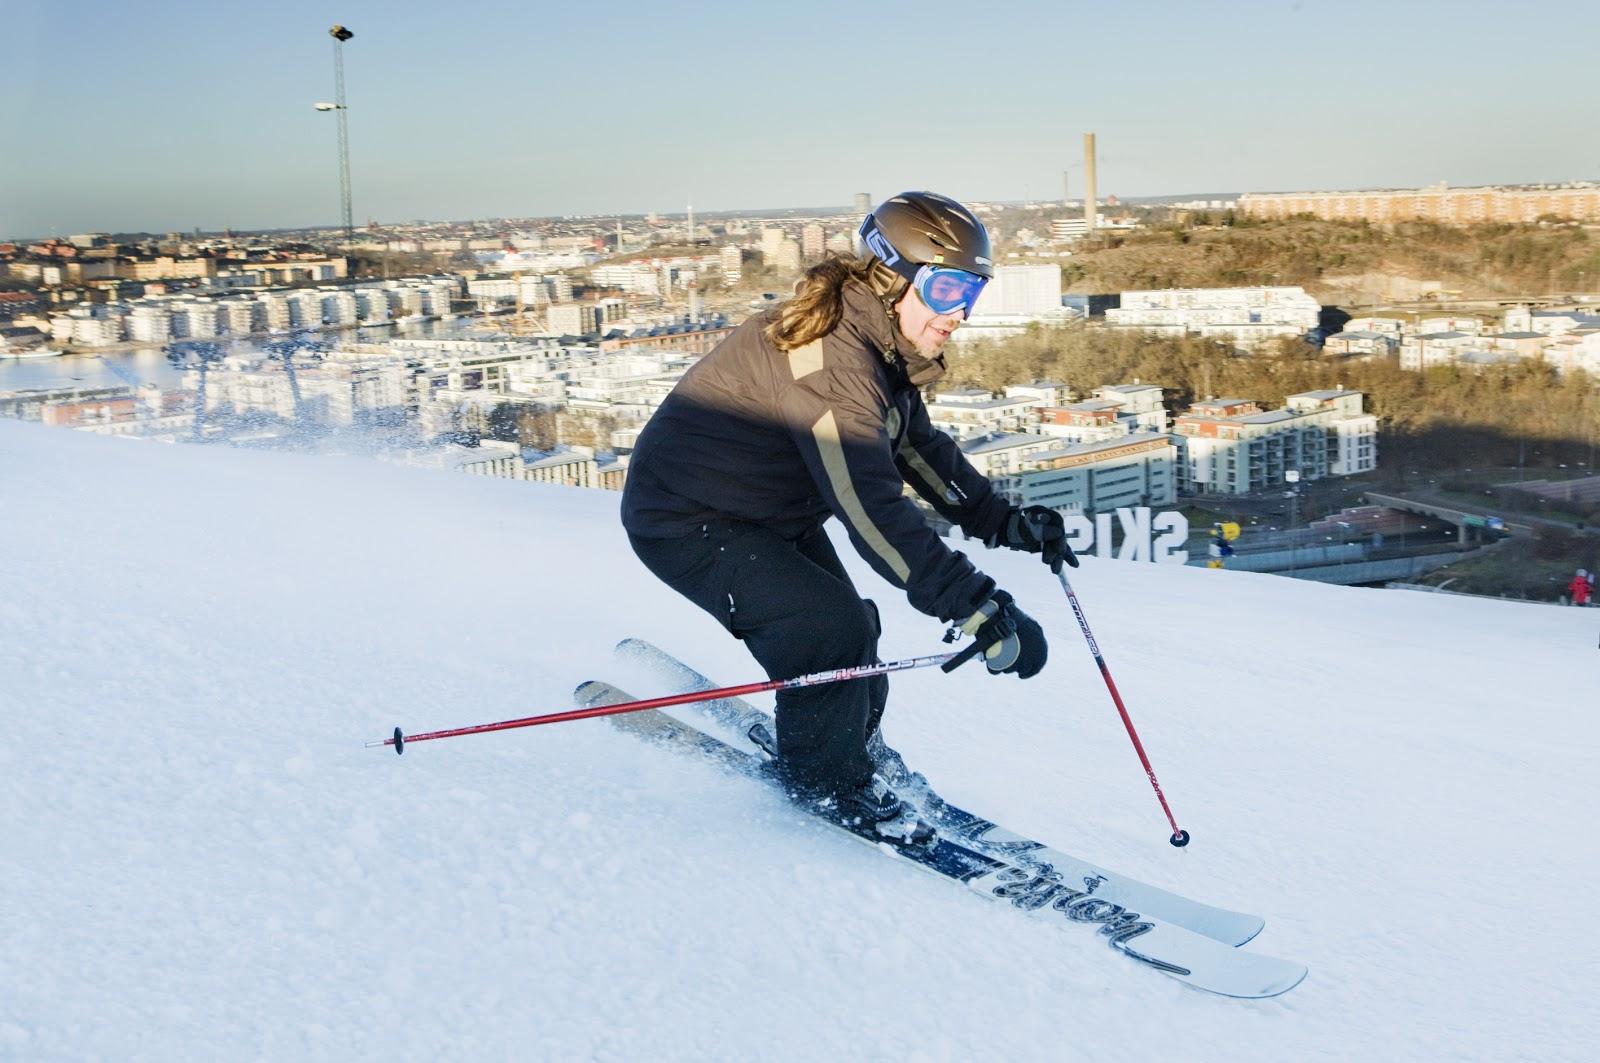 the stockholm tourist: ski slope in stockholm is open!